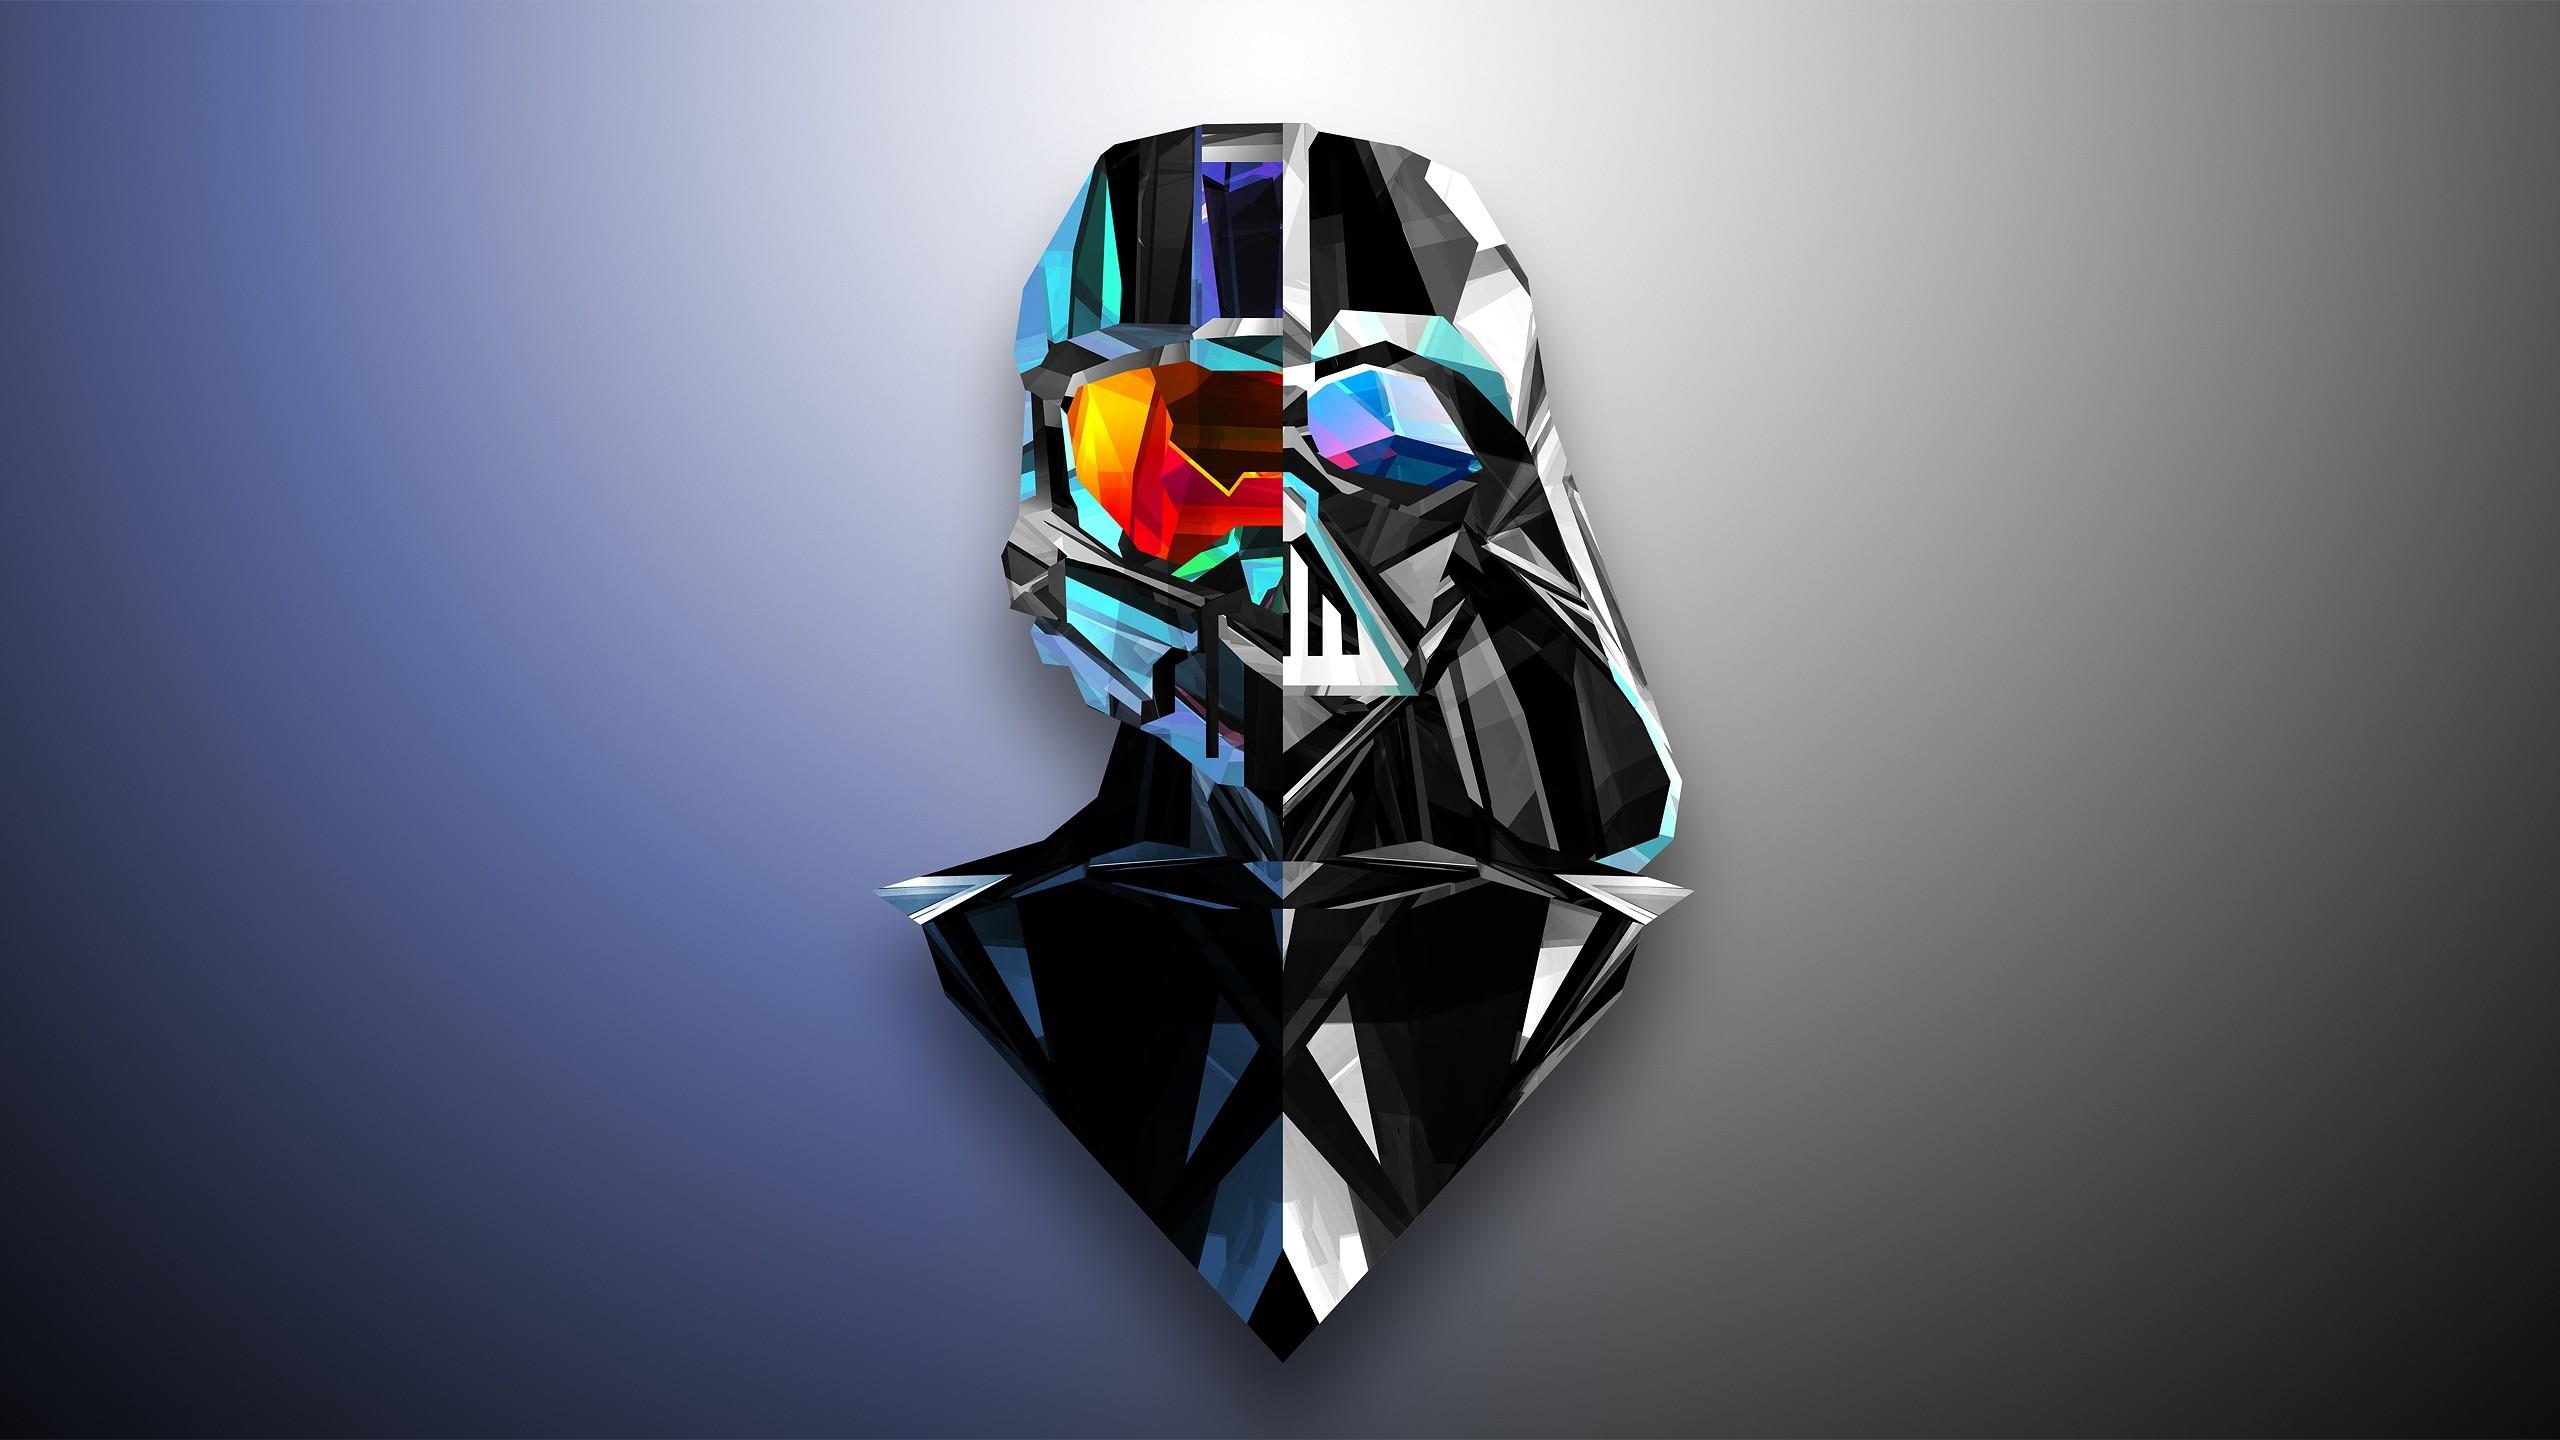 Abstract, Darth Vader, Master Chief, Low Poly, Justin Maller, Halo .